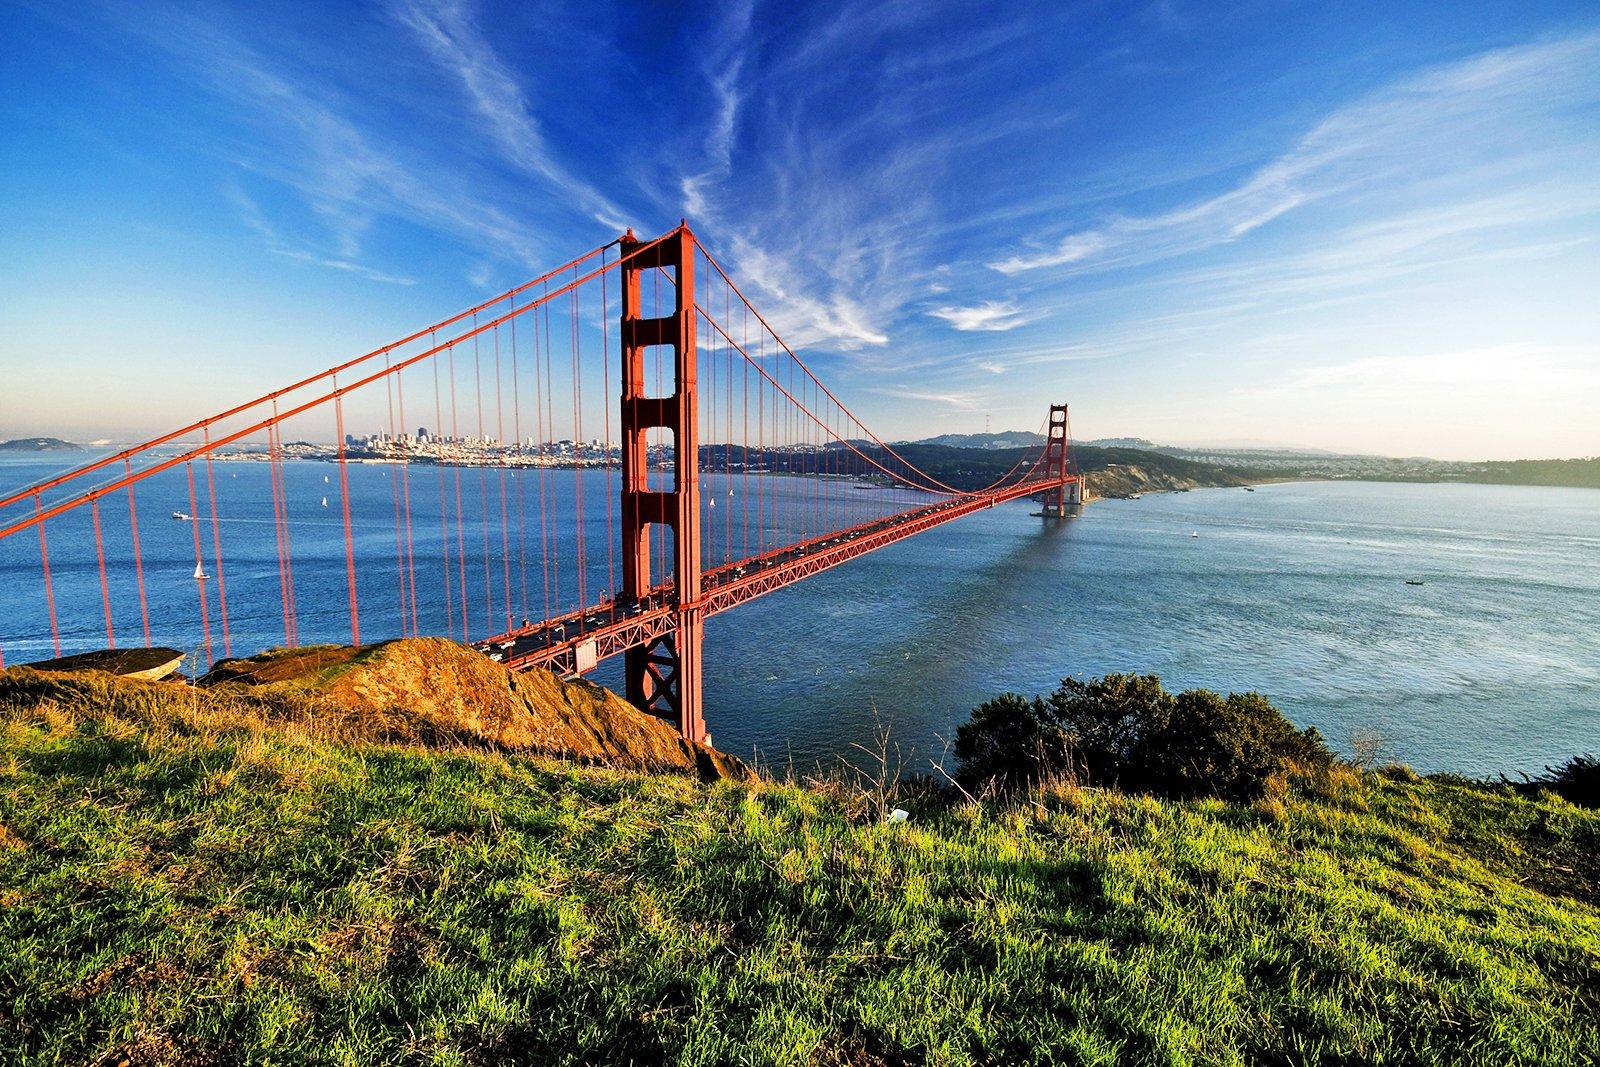 Profondo dating San Francisco